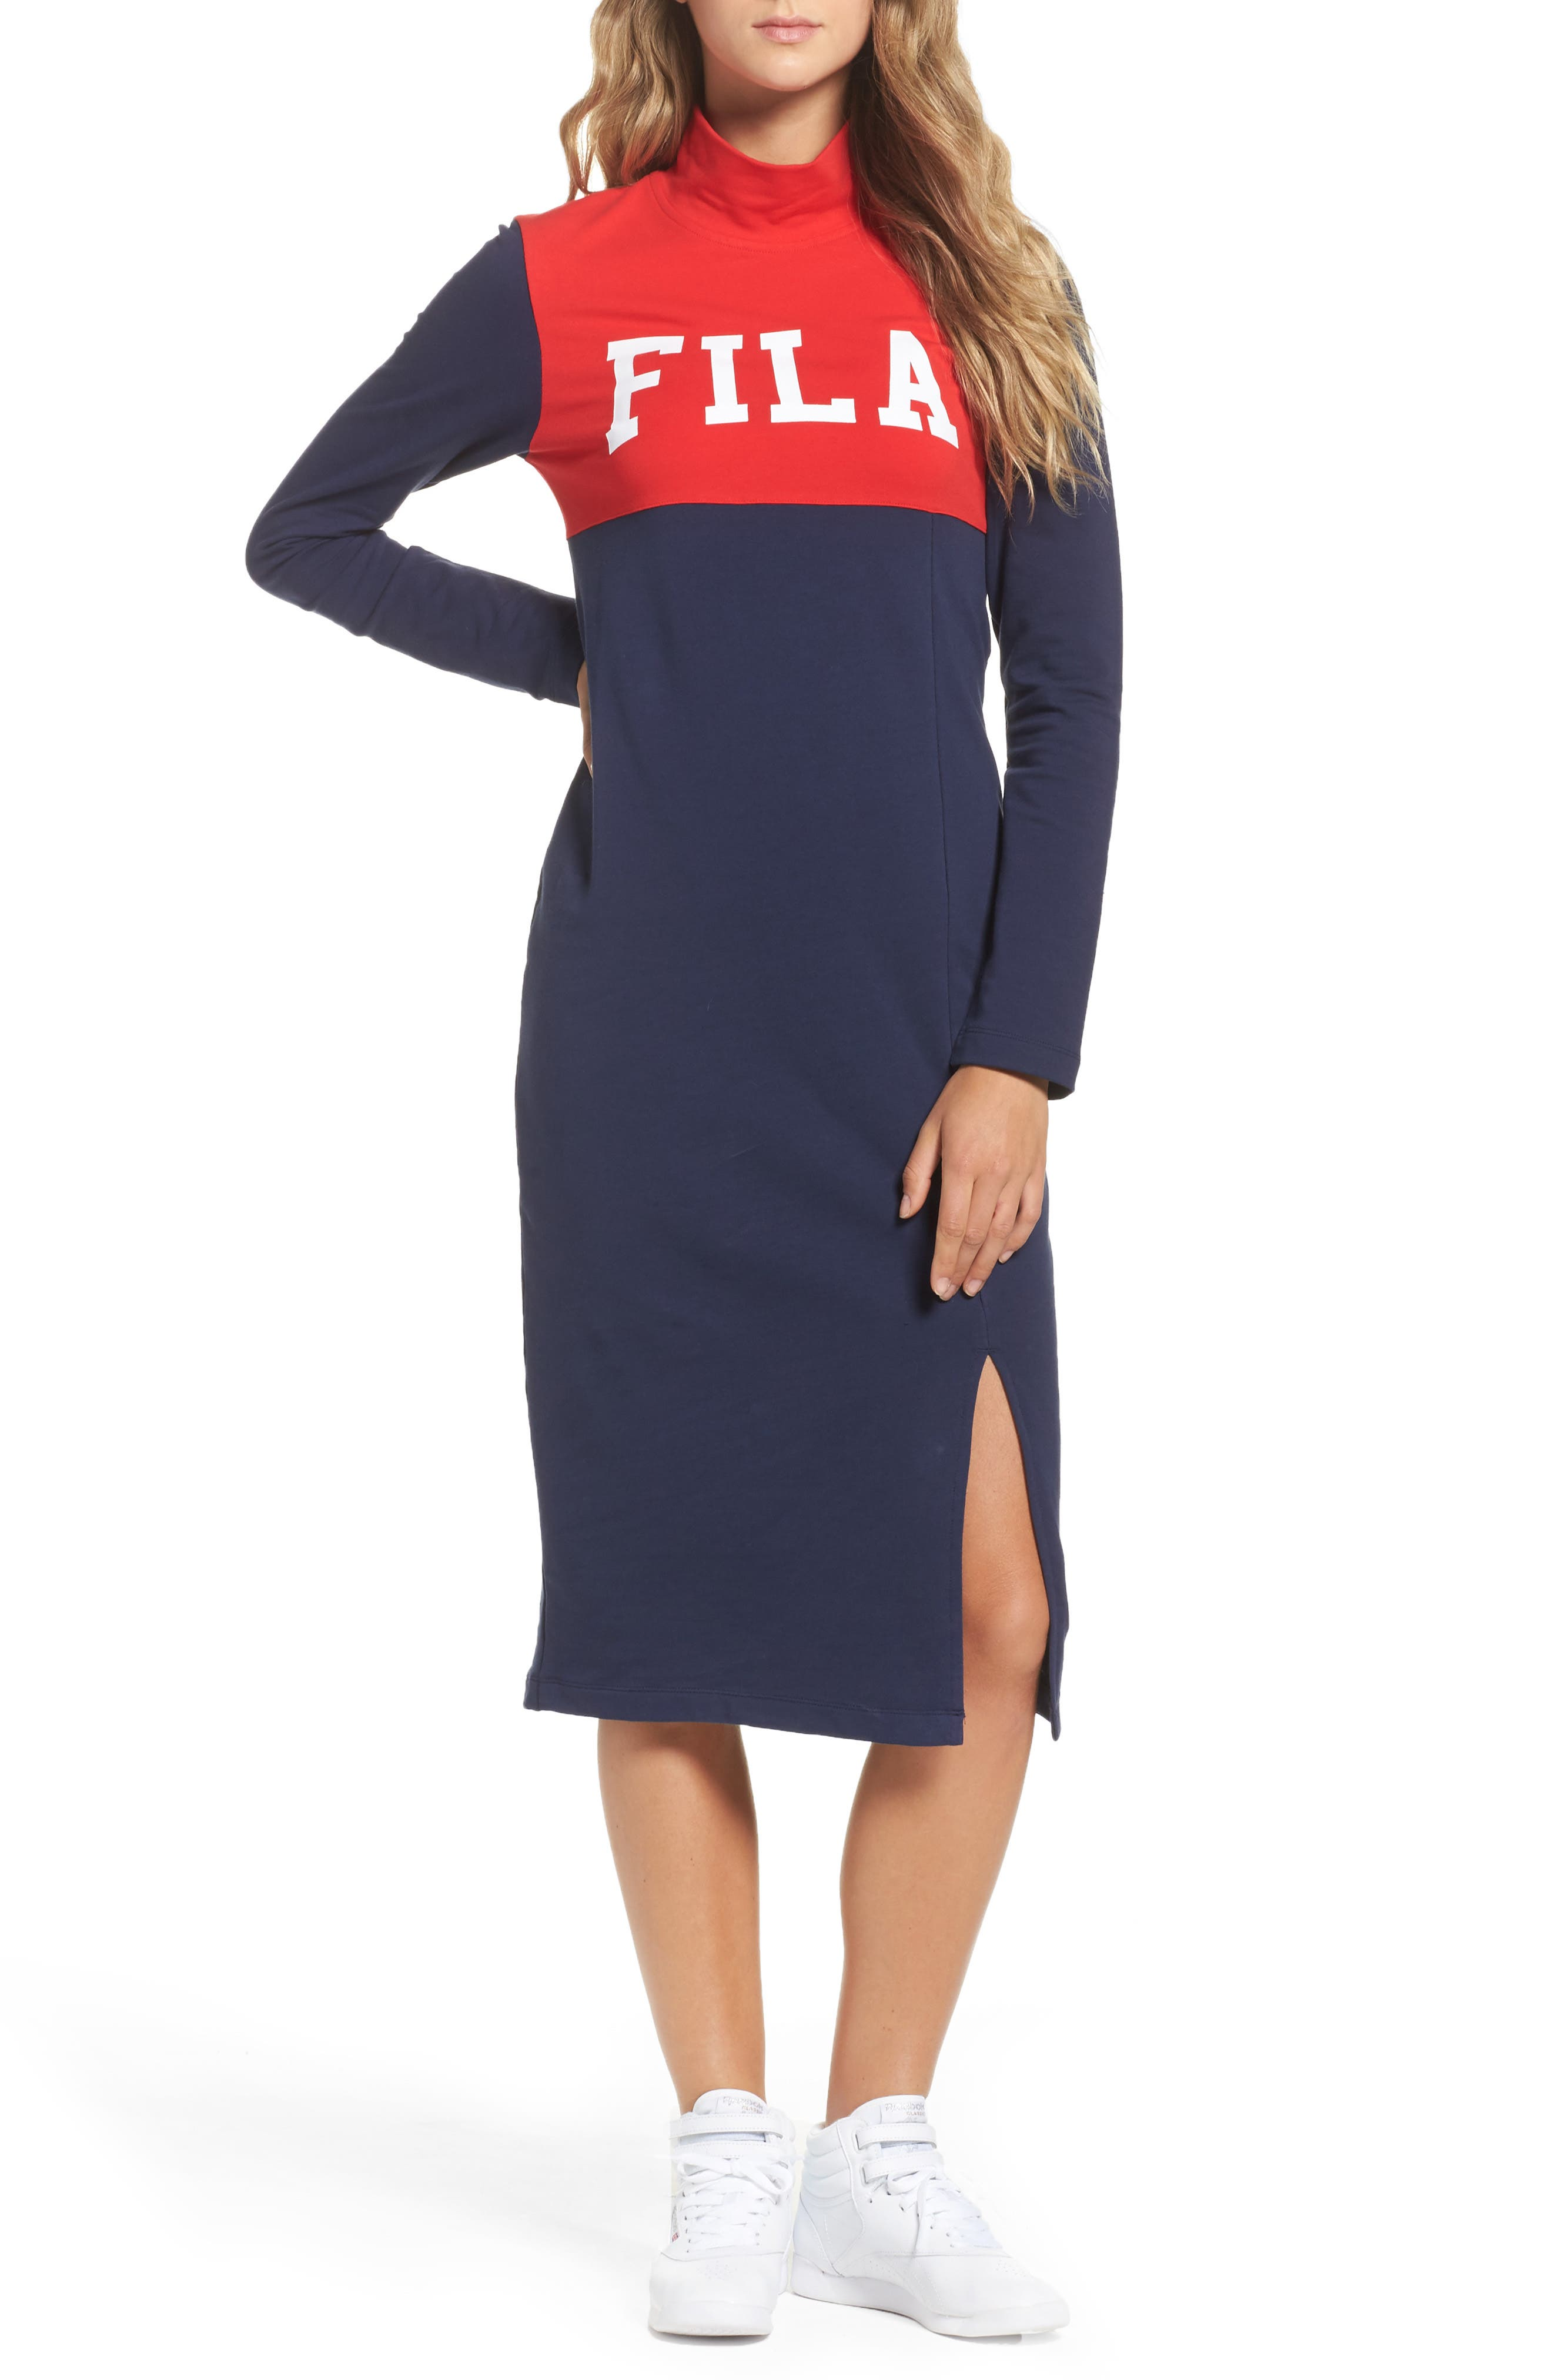 Rio Midi Dress,                         Main,                         color, Rio Red/ Navy/ Skyway